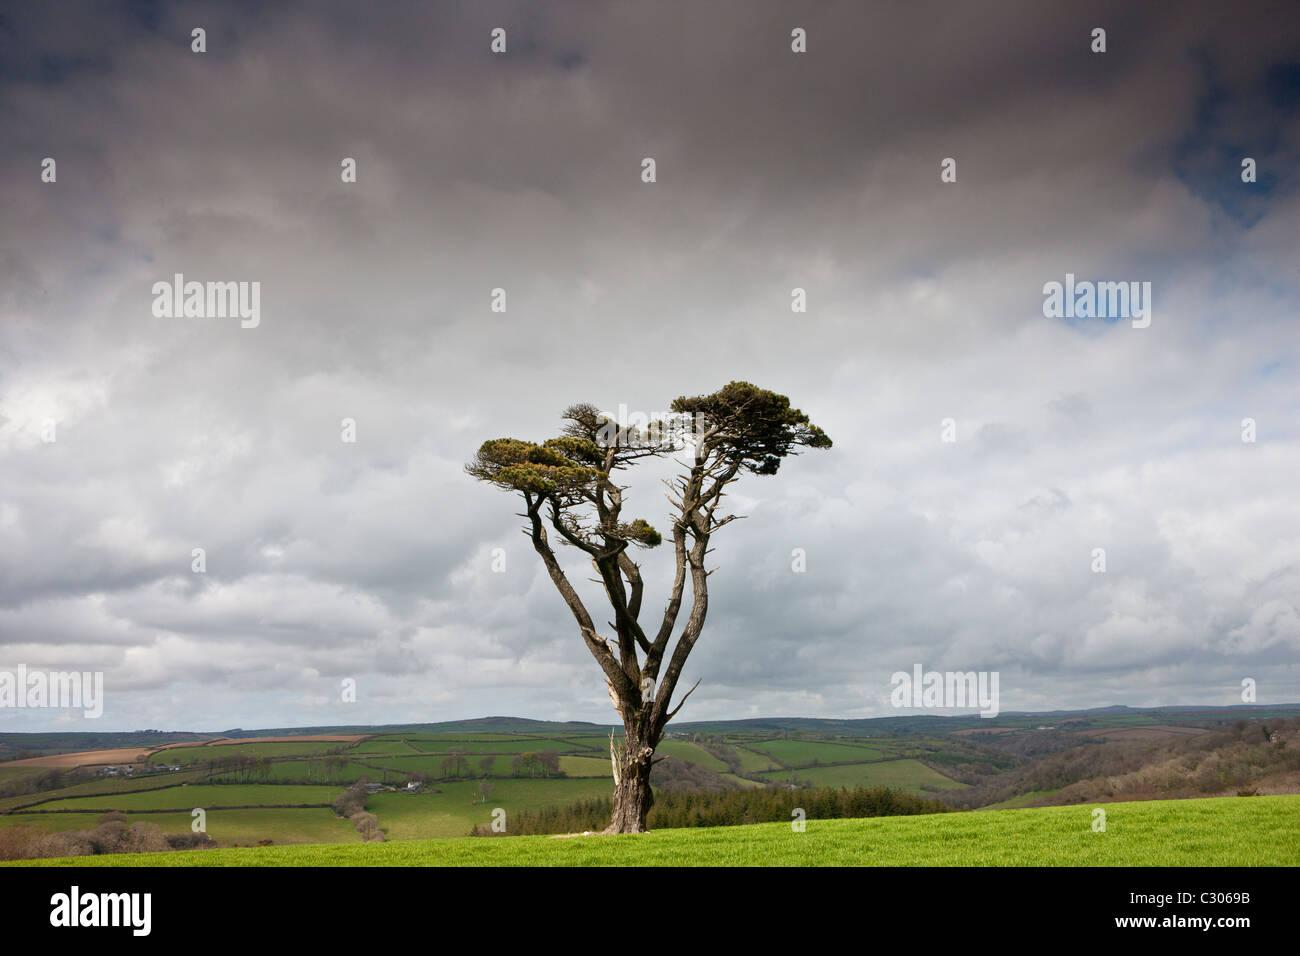 Pino solitario en Bodmin Moor, Cornwall, Inglaterra, Reino Unido. Imagen De Stock